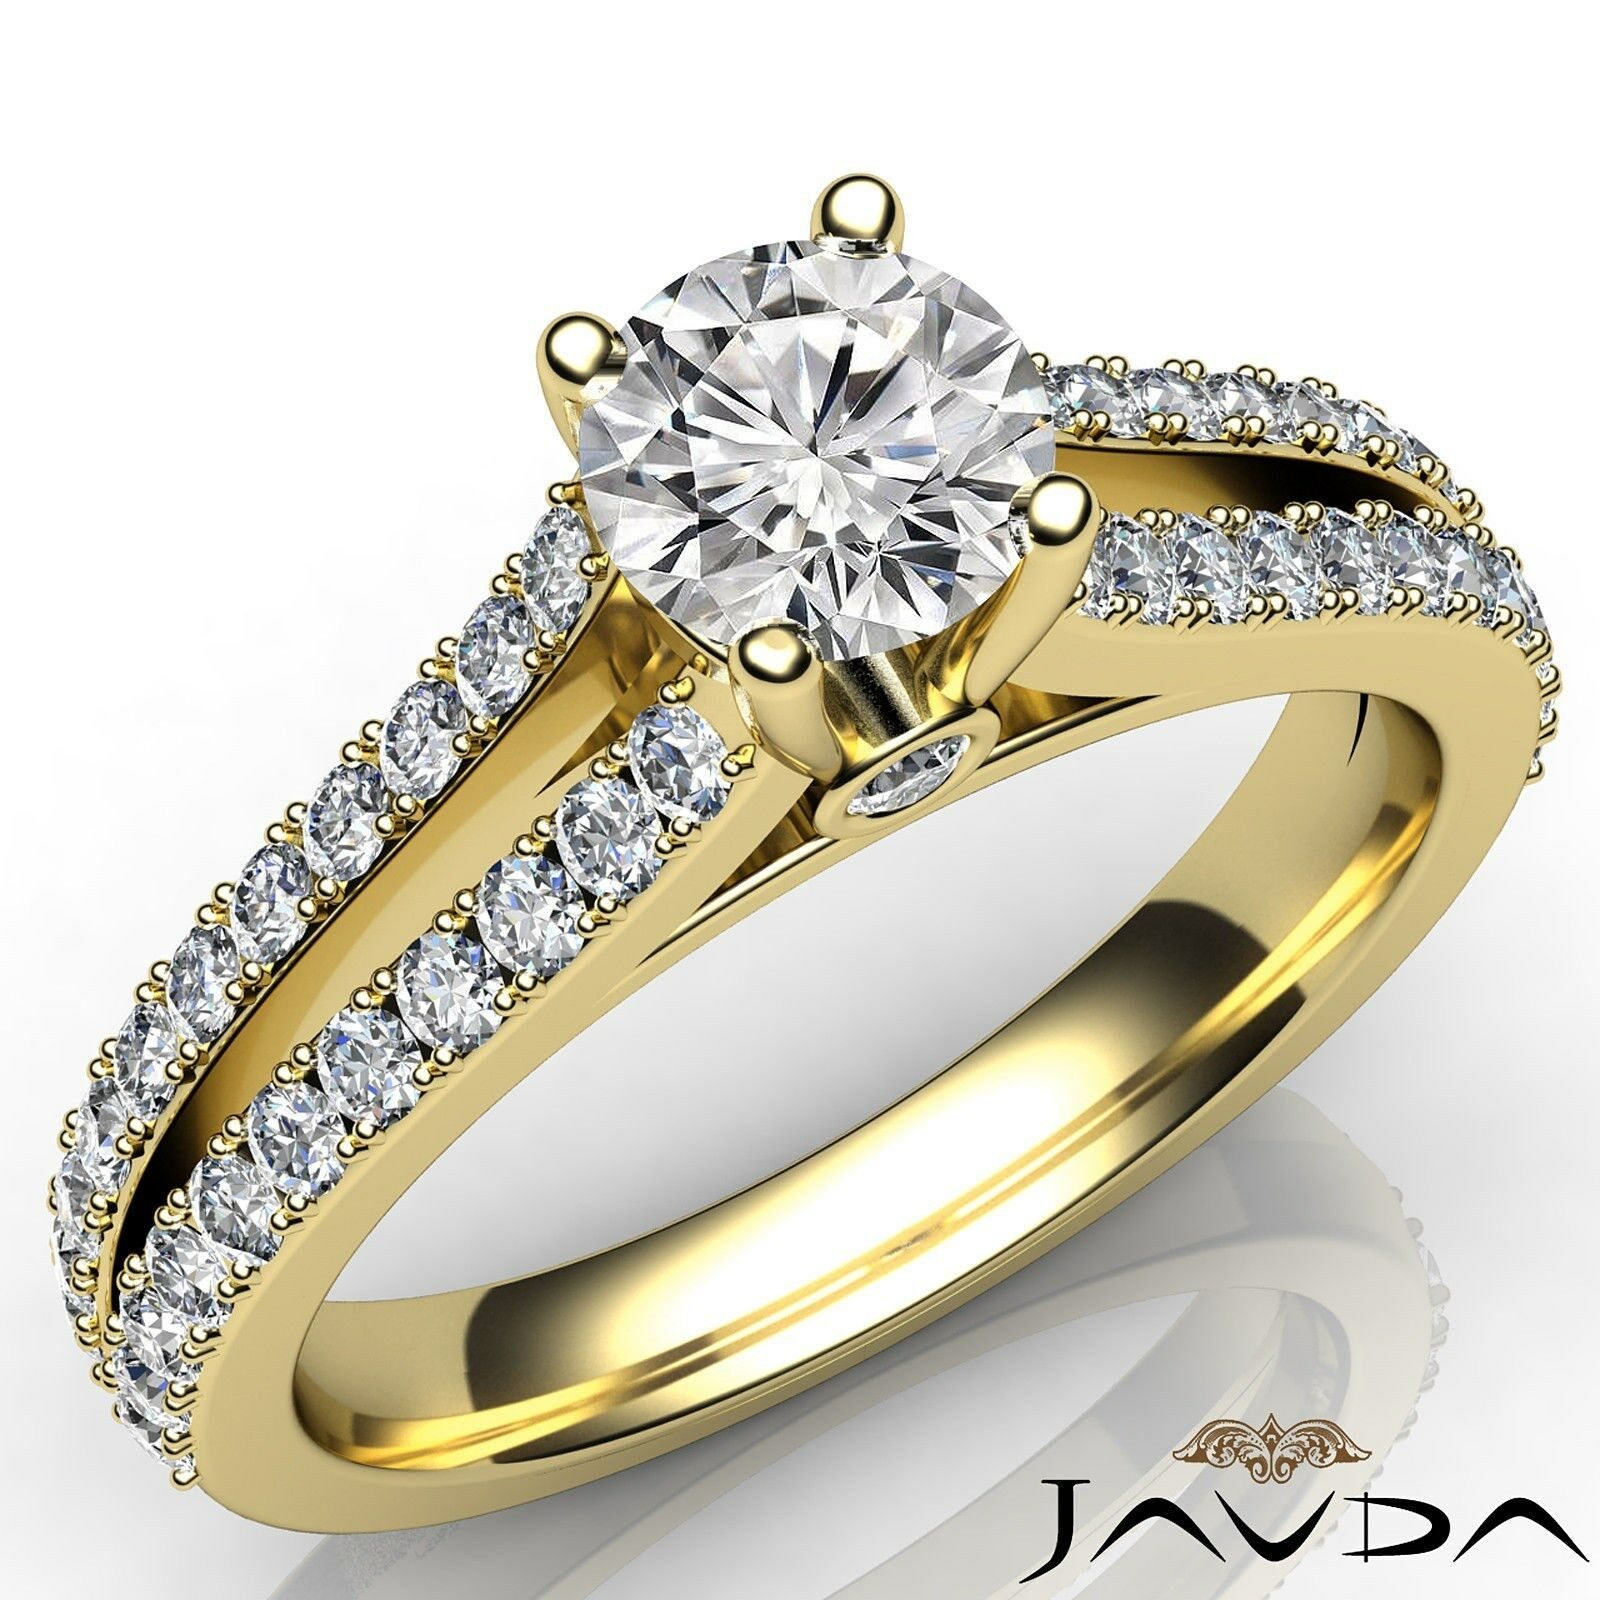 2 Row Split Shank Double Prong Round Diamond Engagement Ring GIA E VS2 1.15 Ct